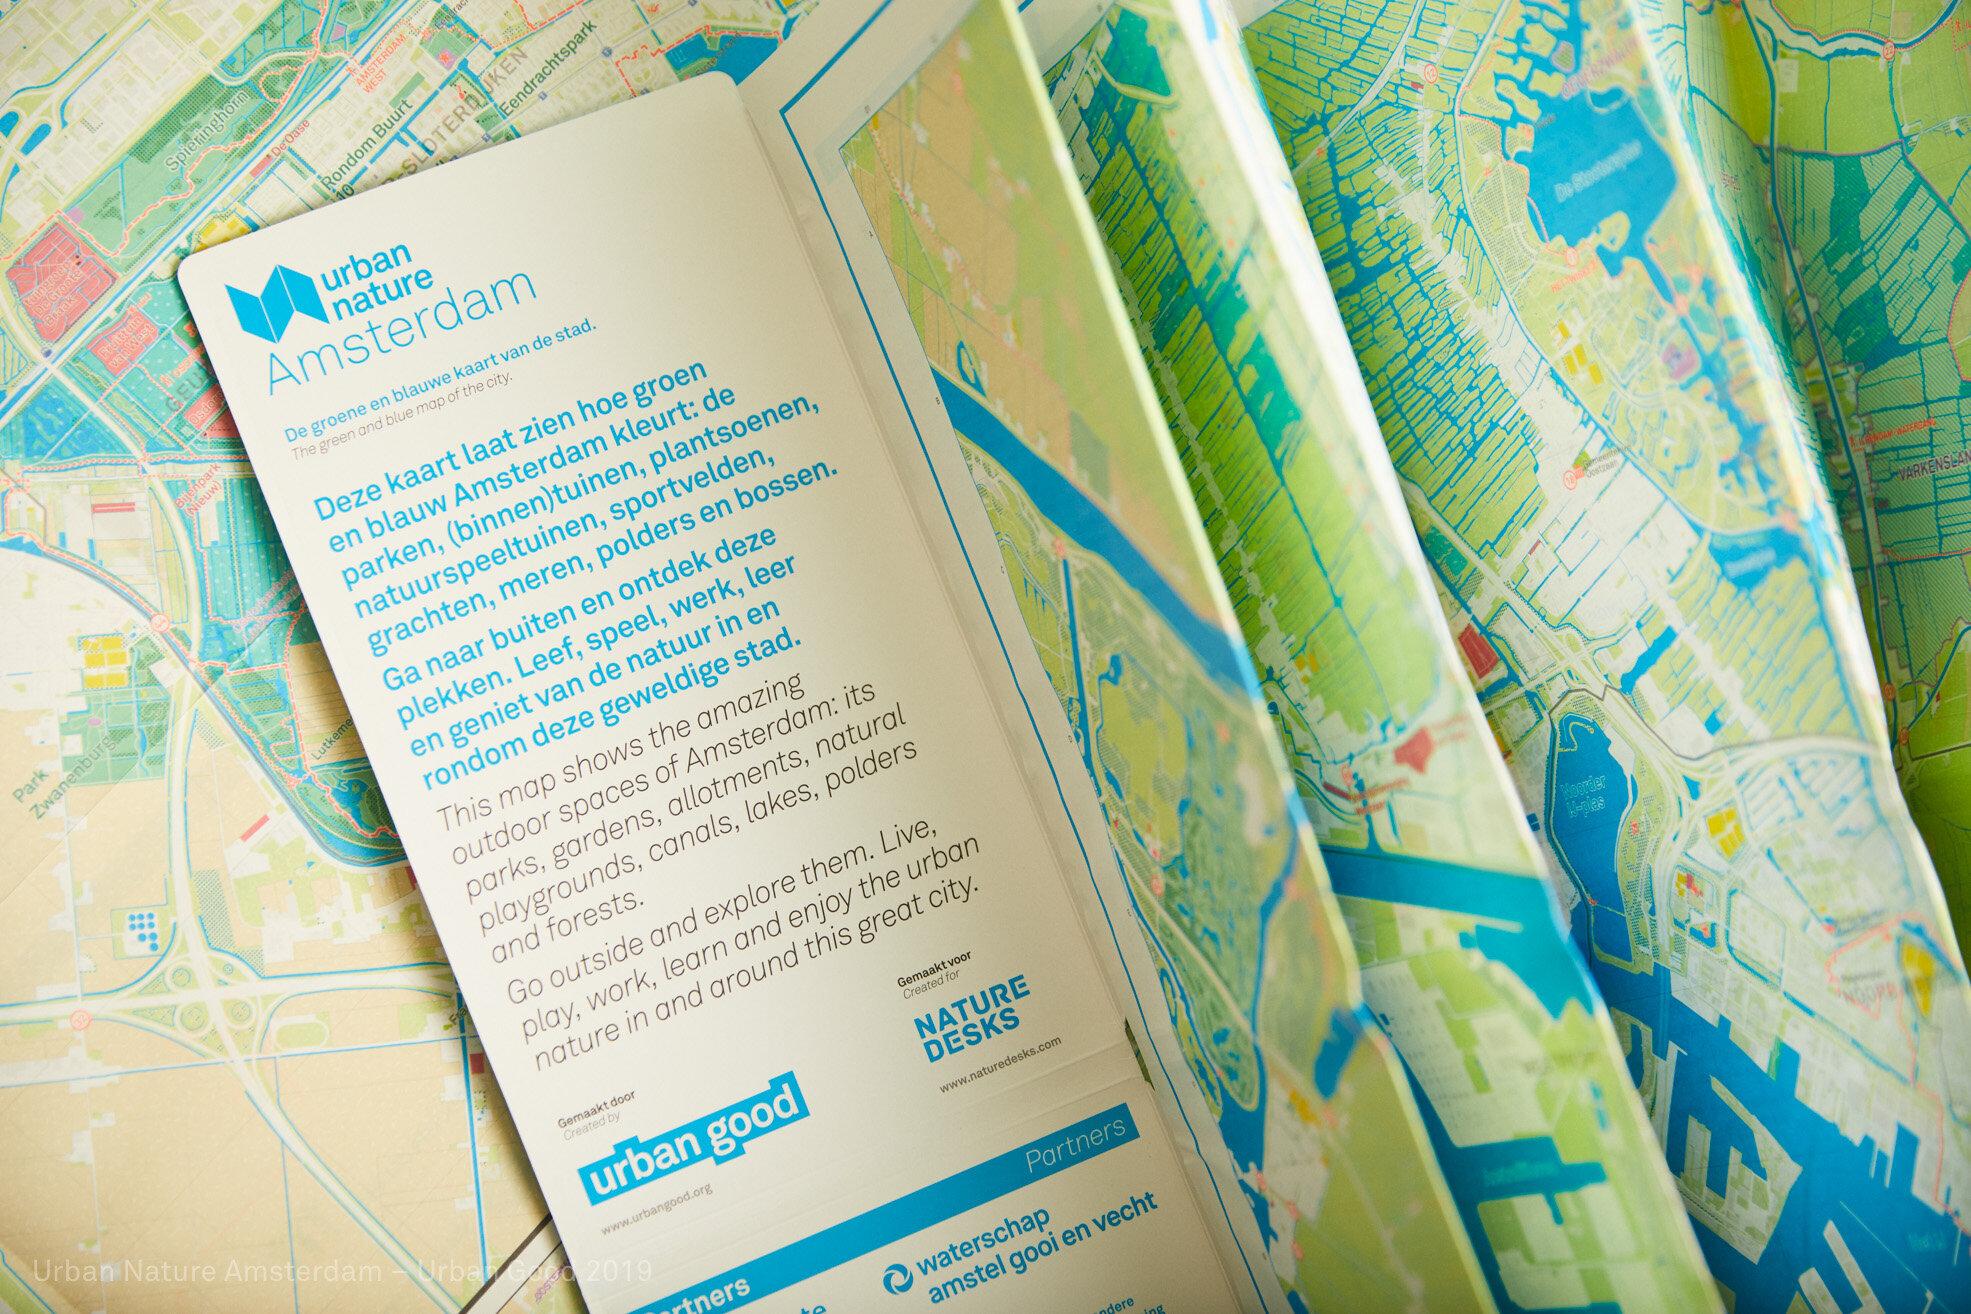 Urban Nature Amsterdam MAP - Charlie Peel - (c) Paul Cochrane, Urban Good 2019-16.jpg